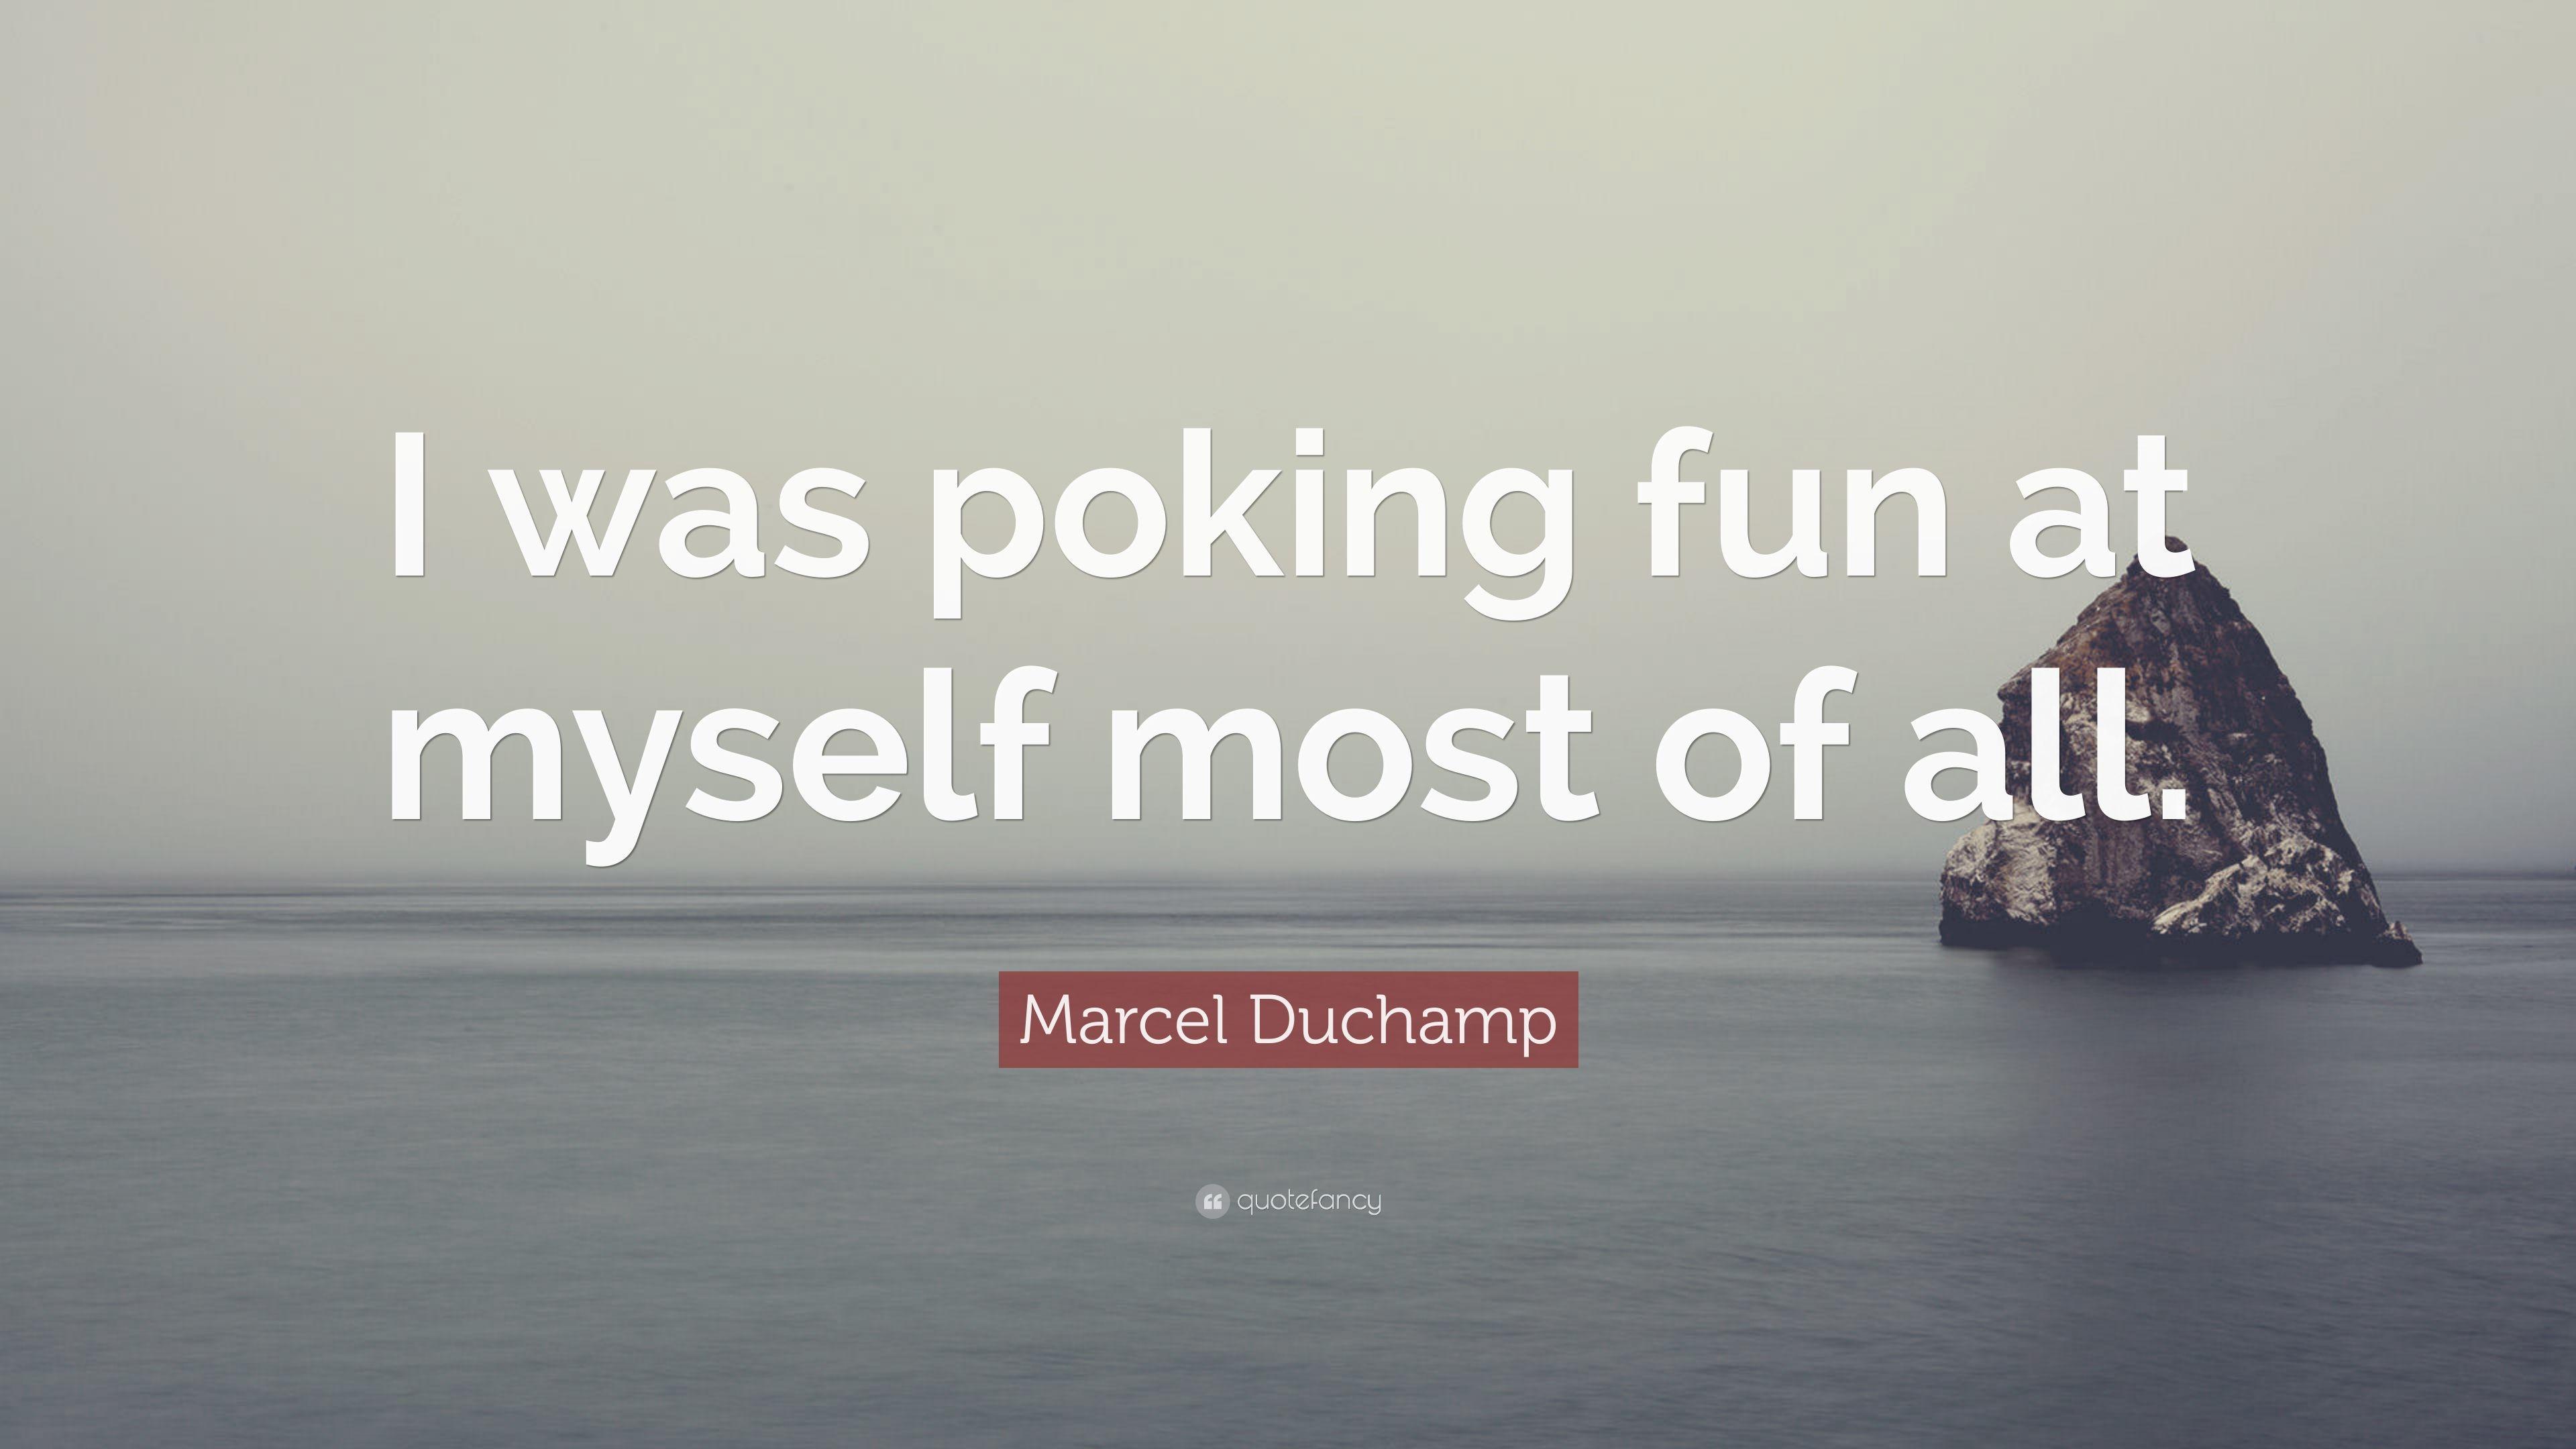 3840x2160 Marcel Duchamp Trích dẫn: